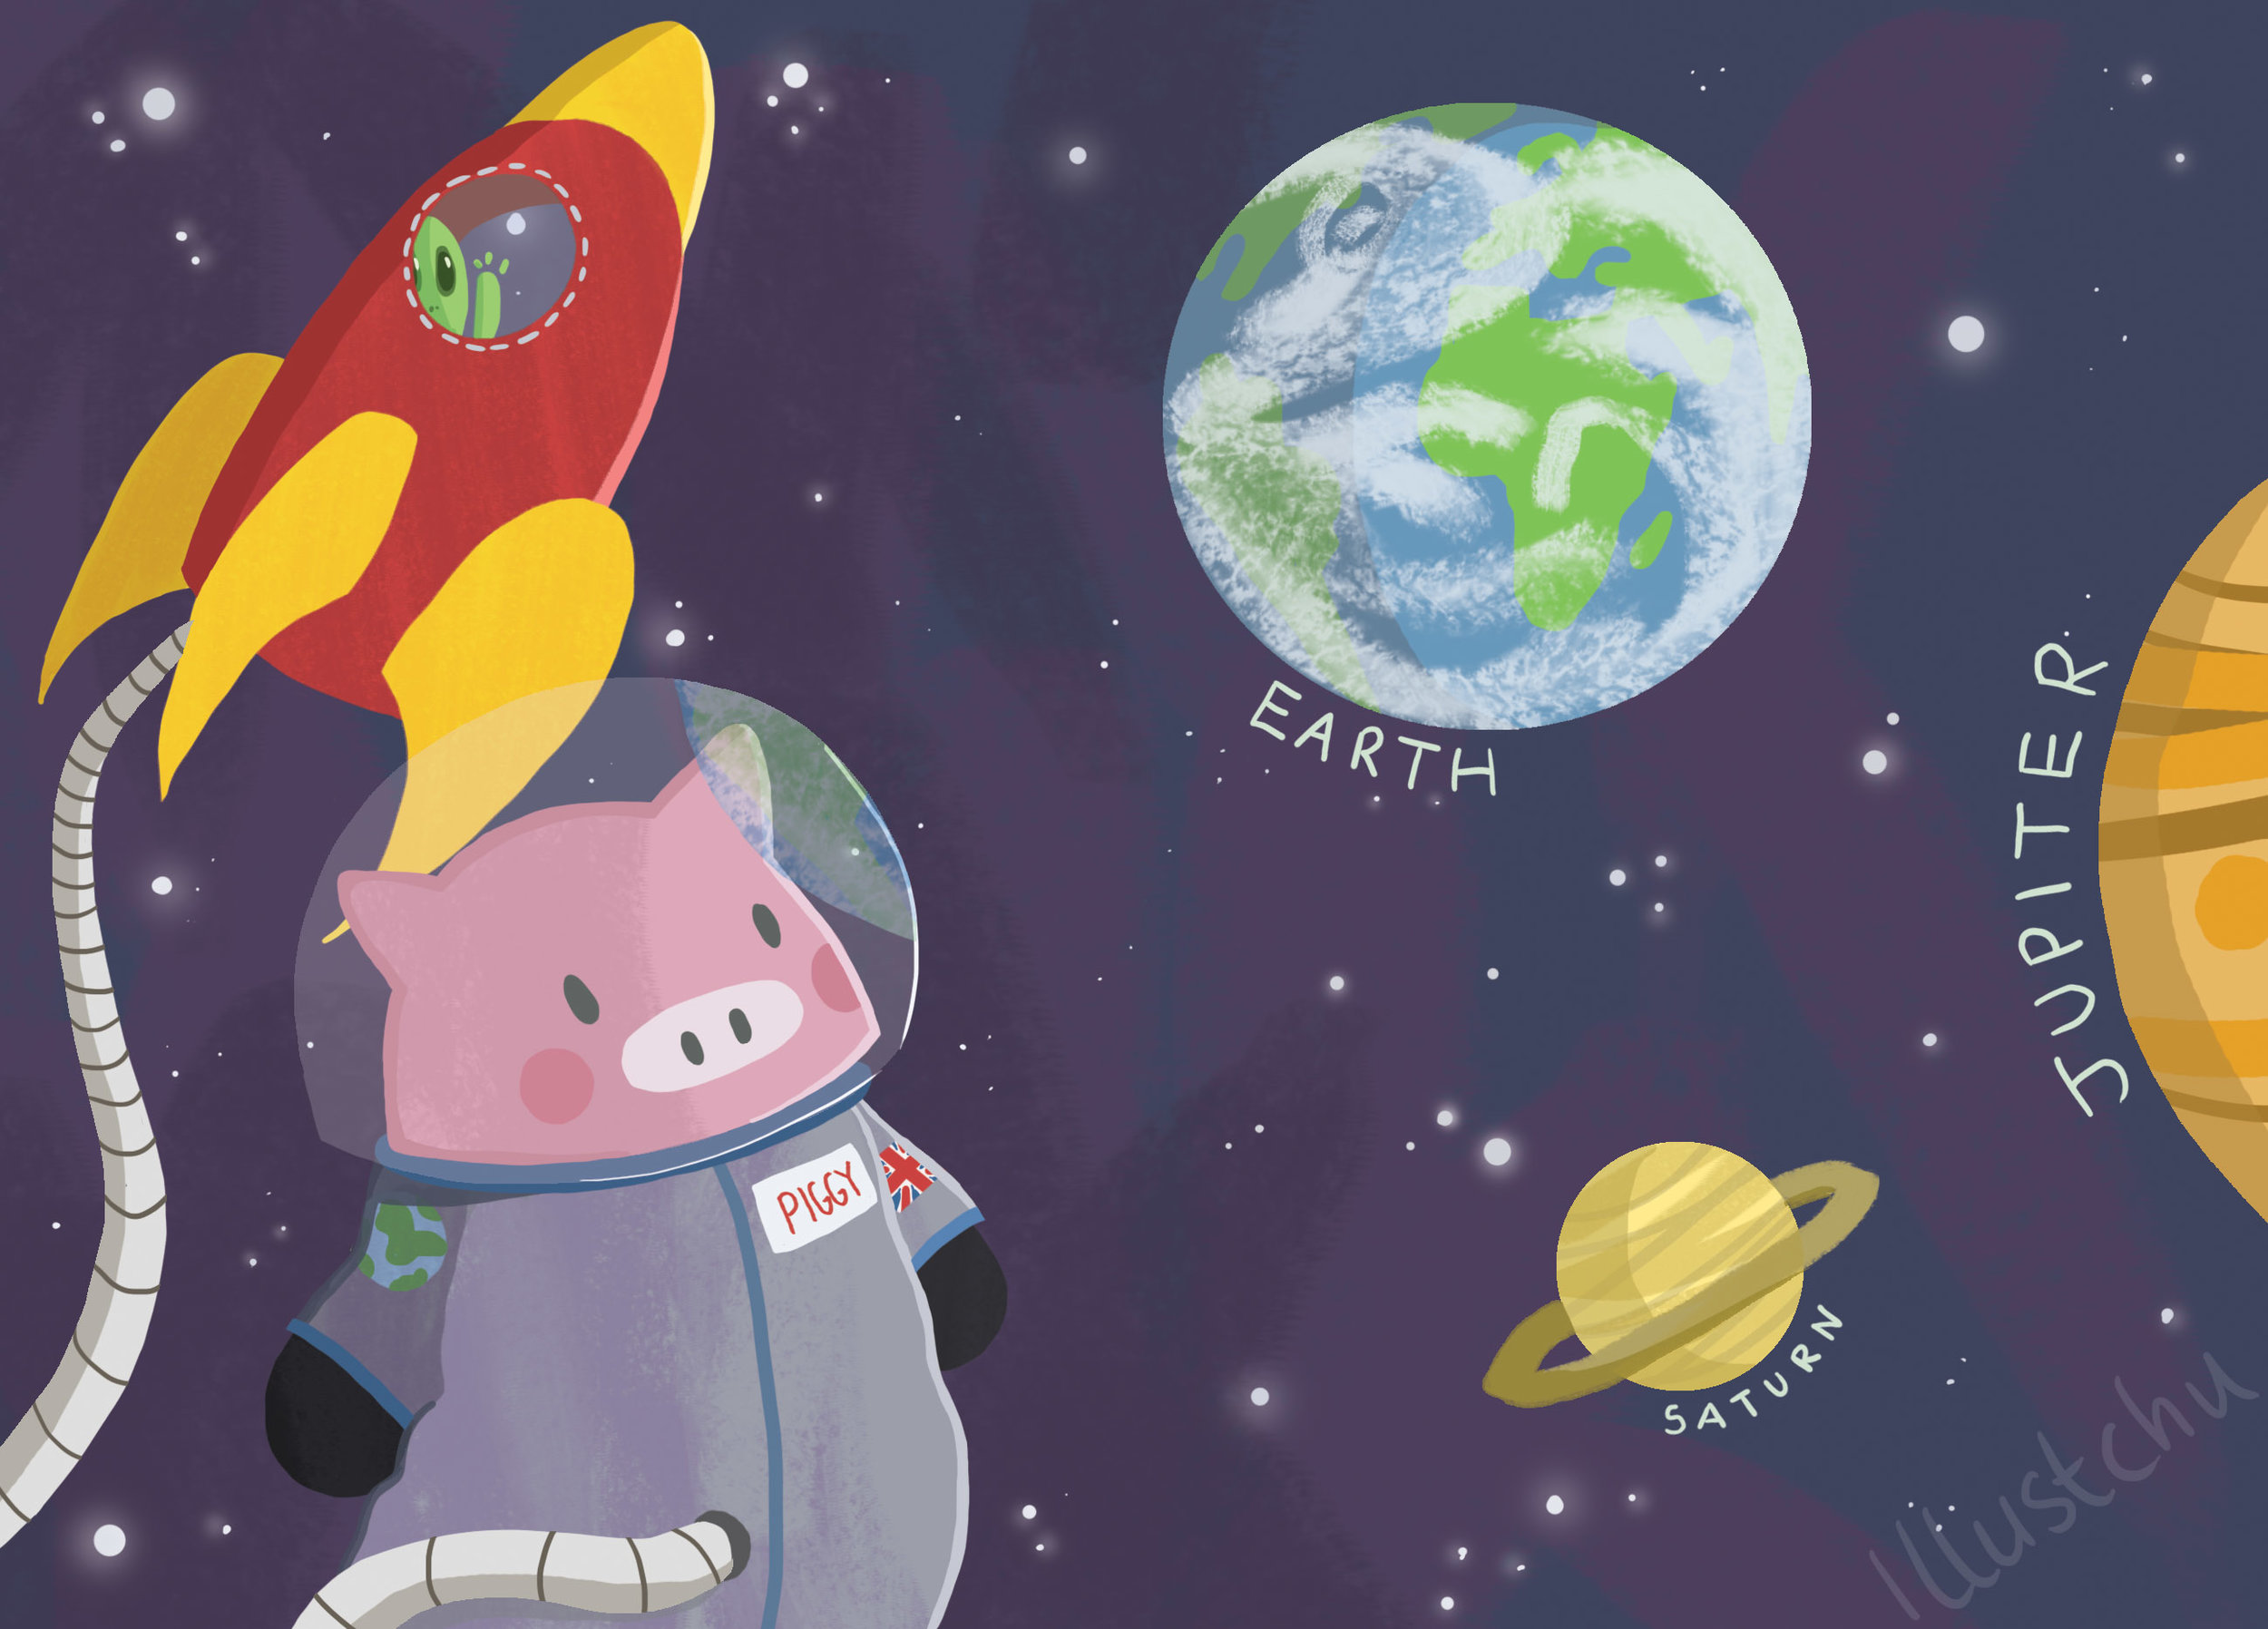 Space piggy rgb.jpg